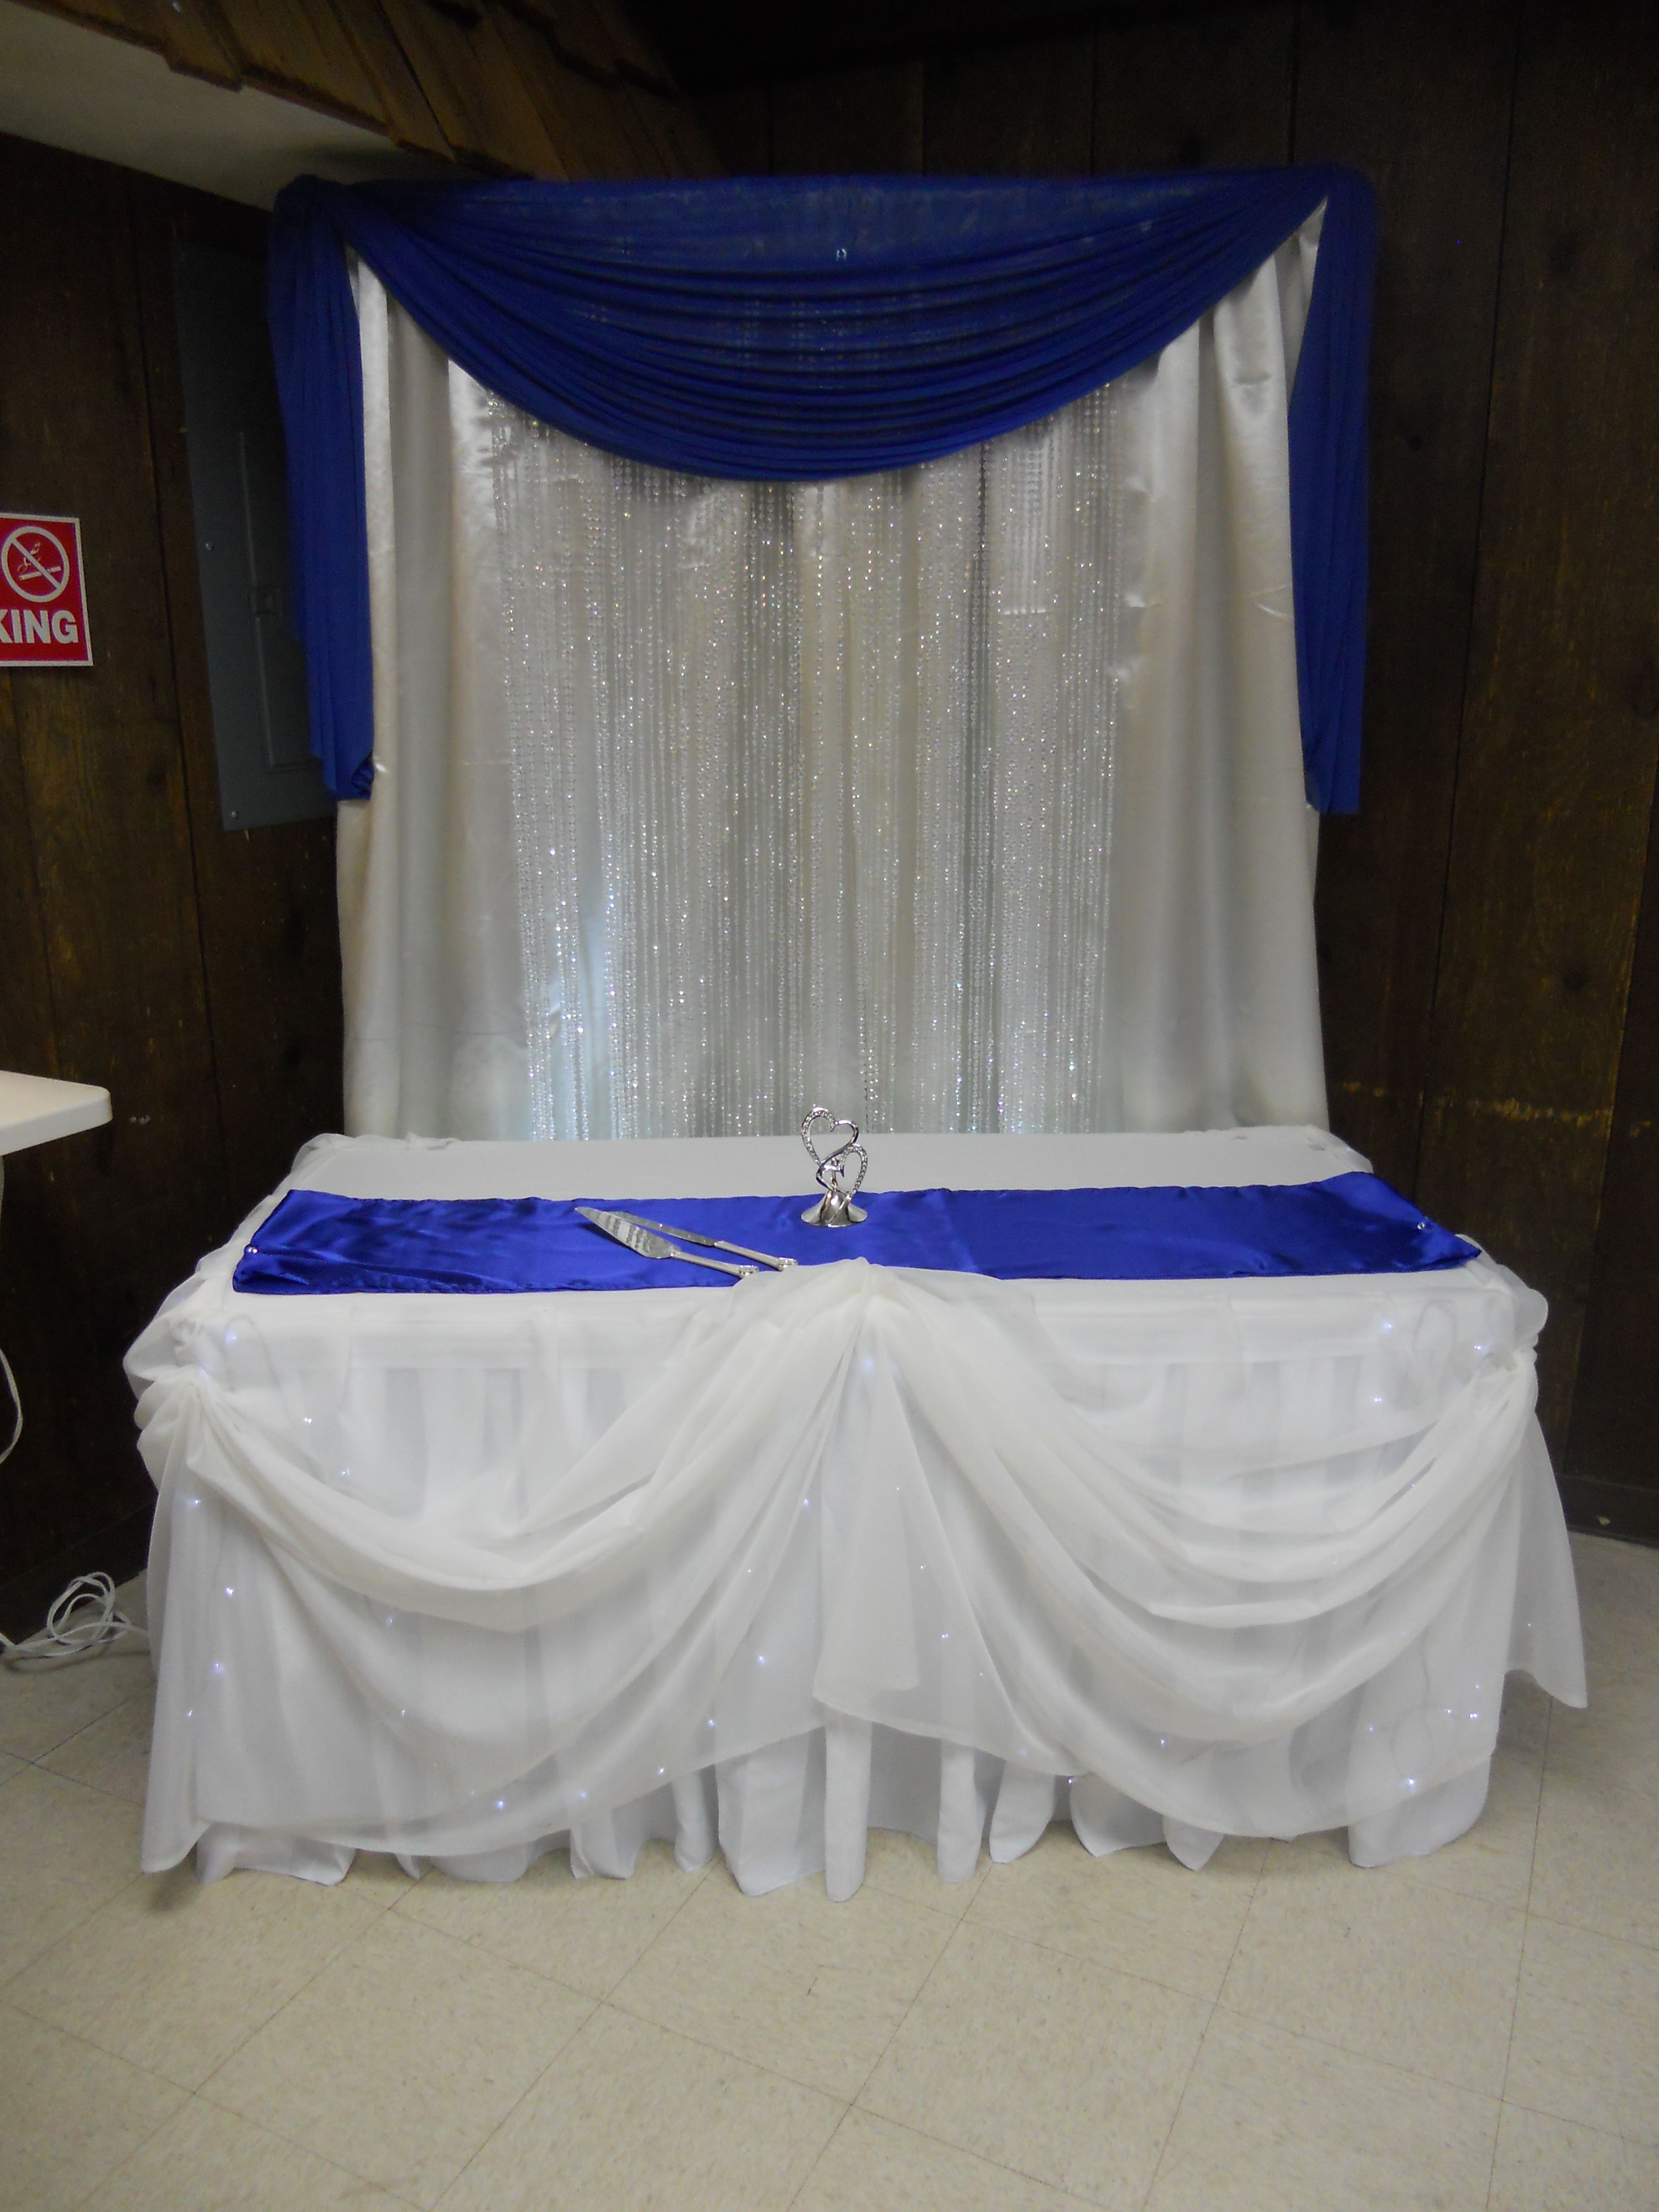 Cake Table Royal Blue Wedding Backdrop Ideas Blue